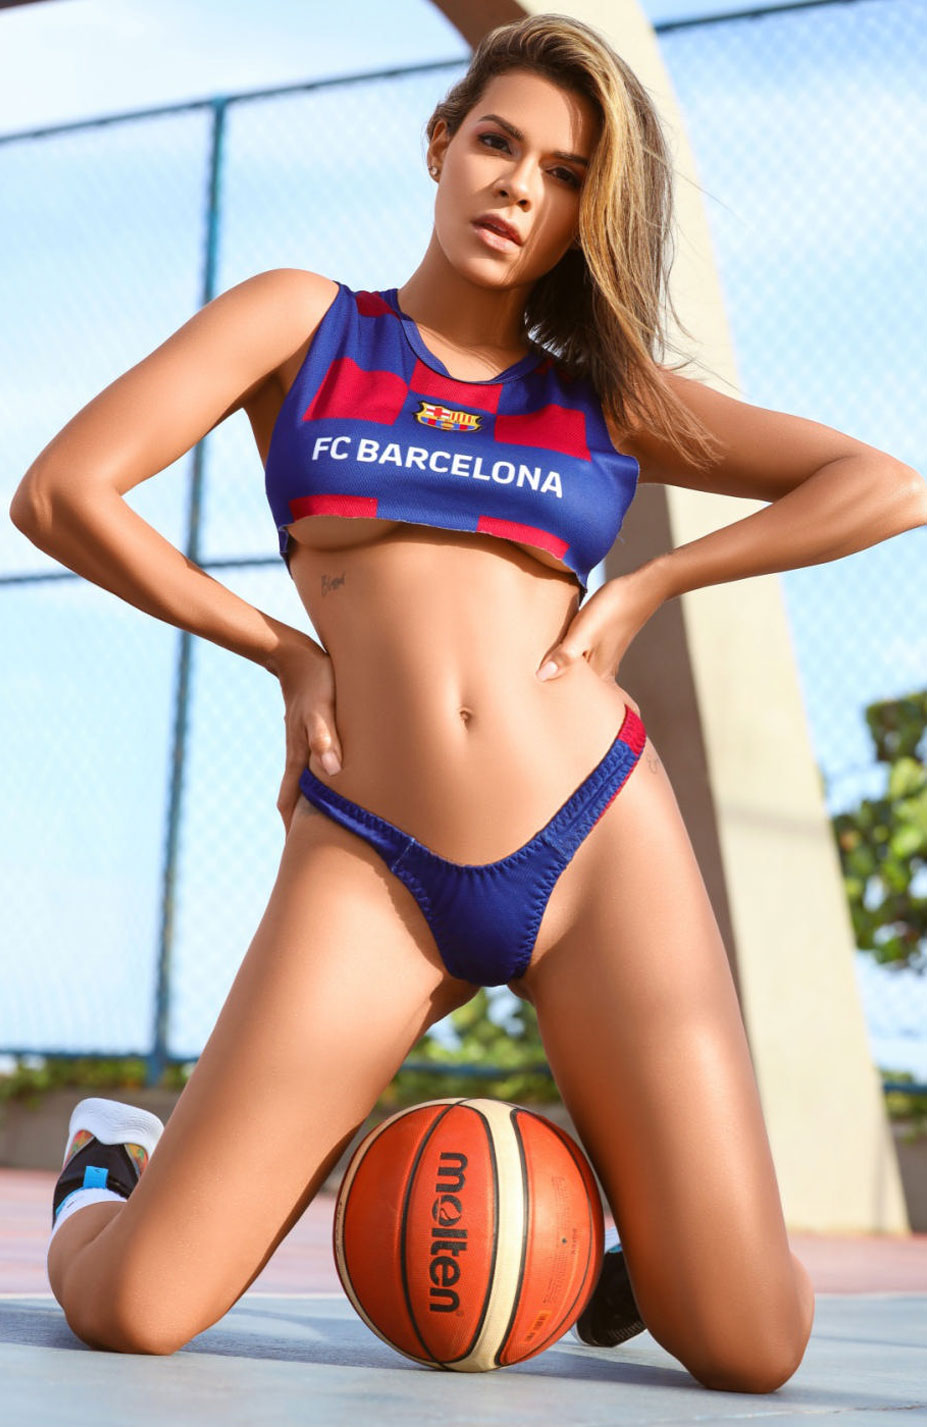 Луана Санден проводит разминку с баскетбольным мячом / фото 05